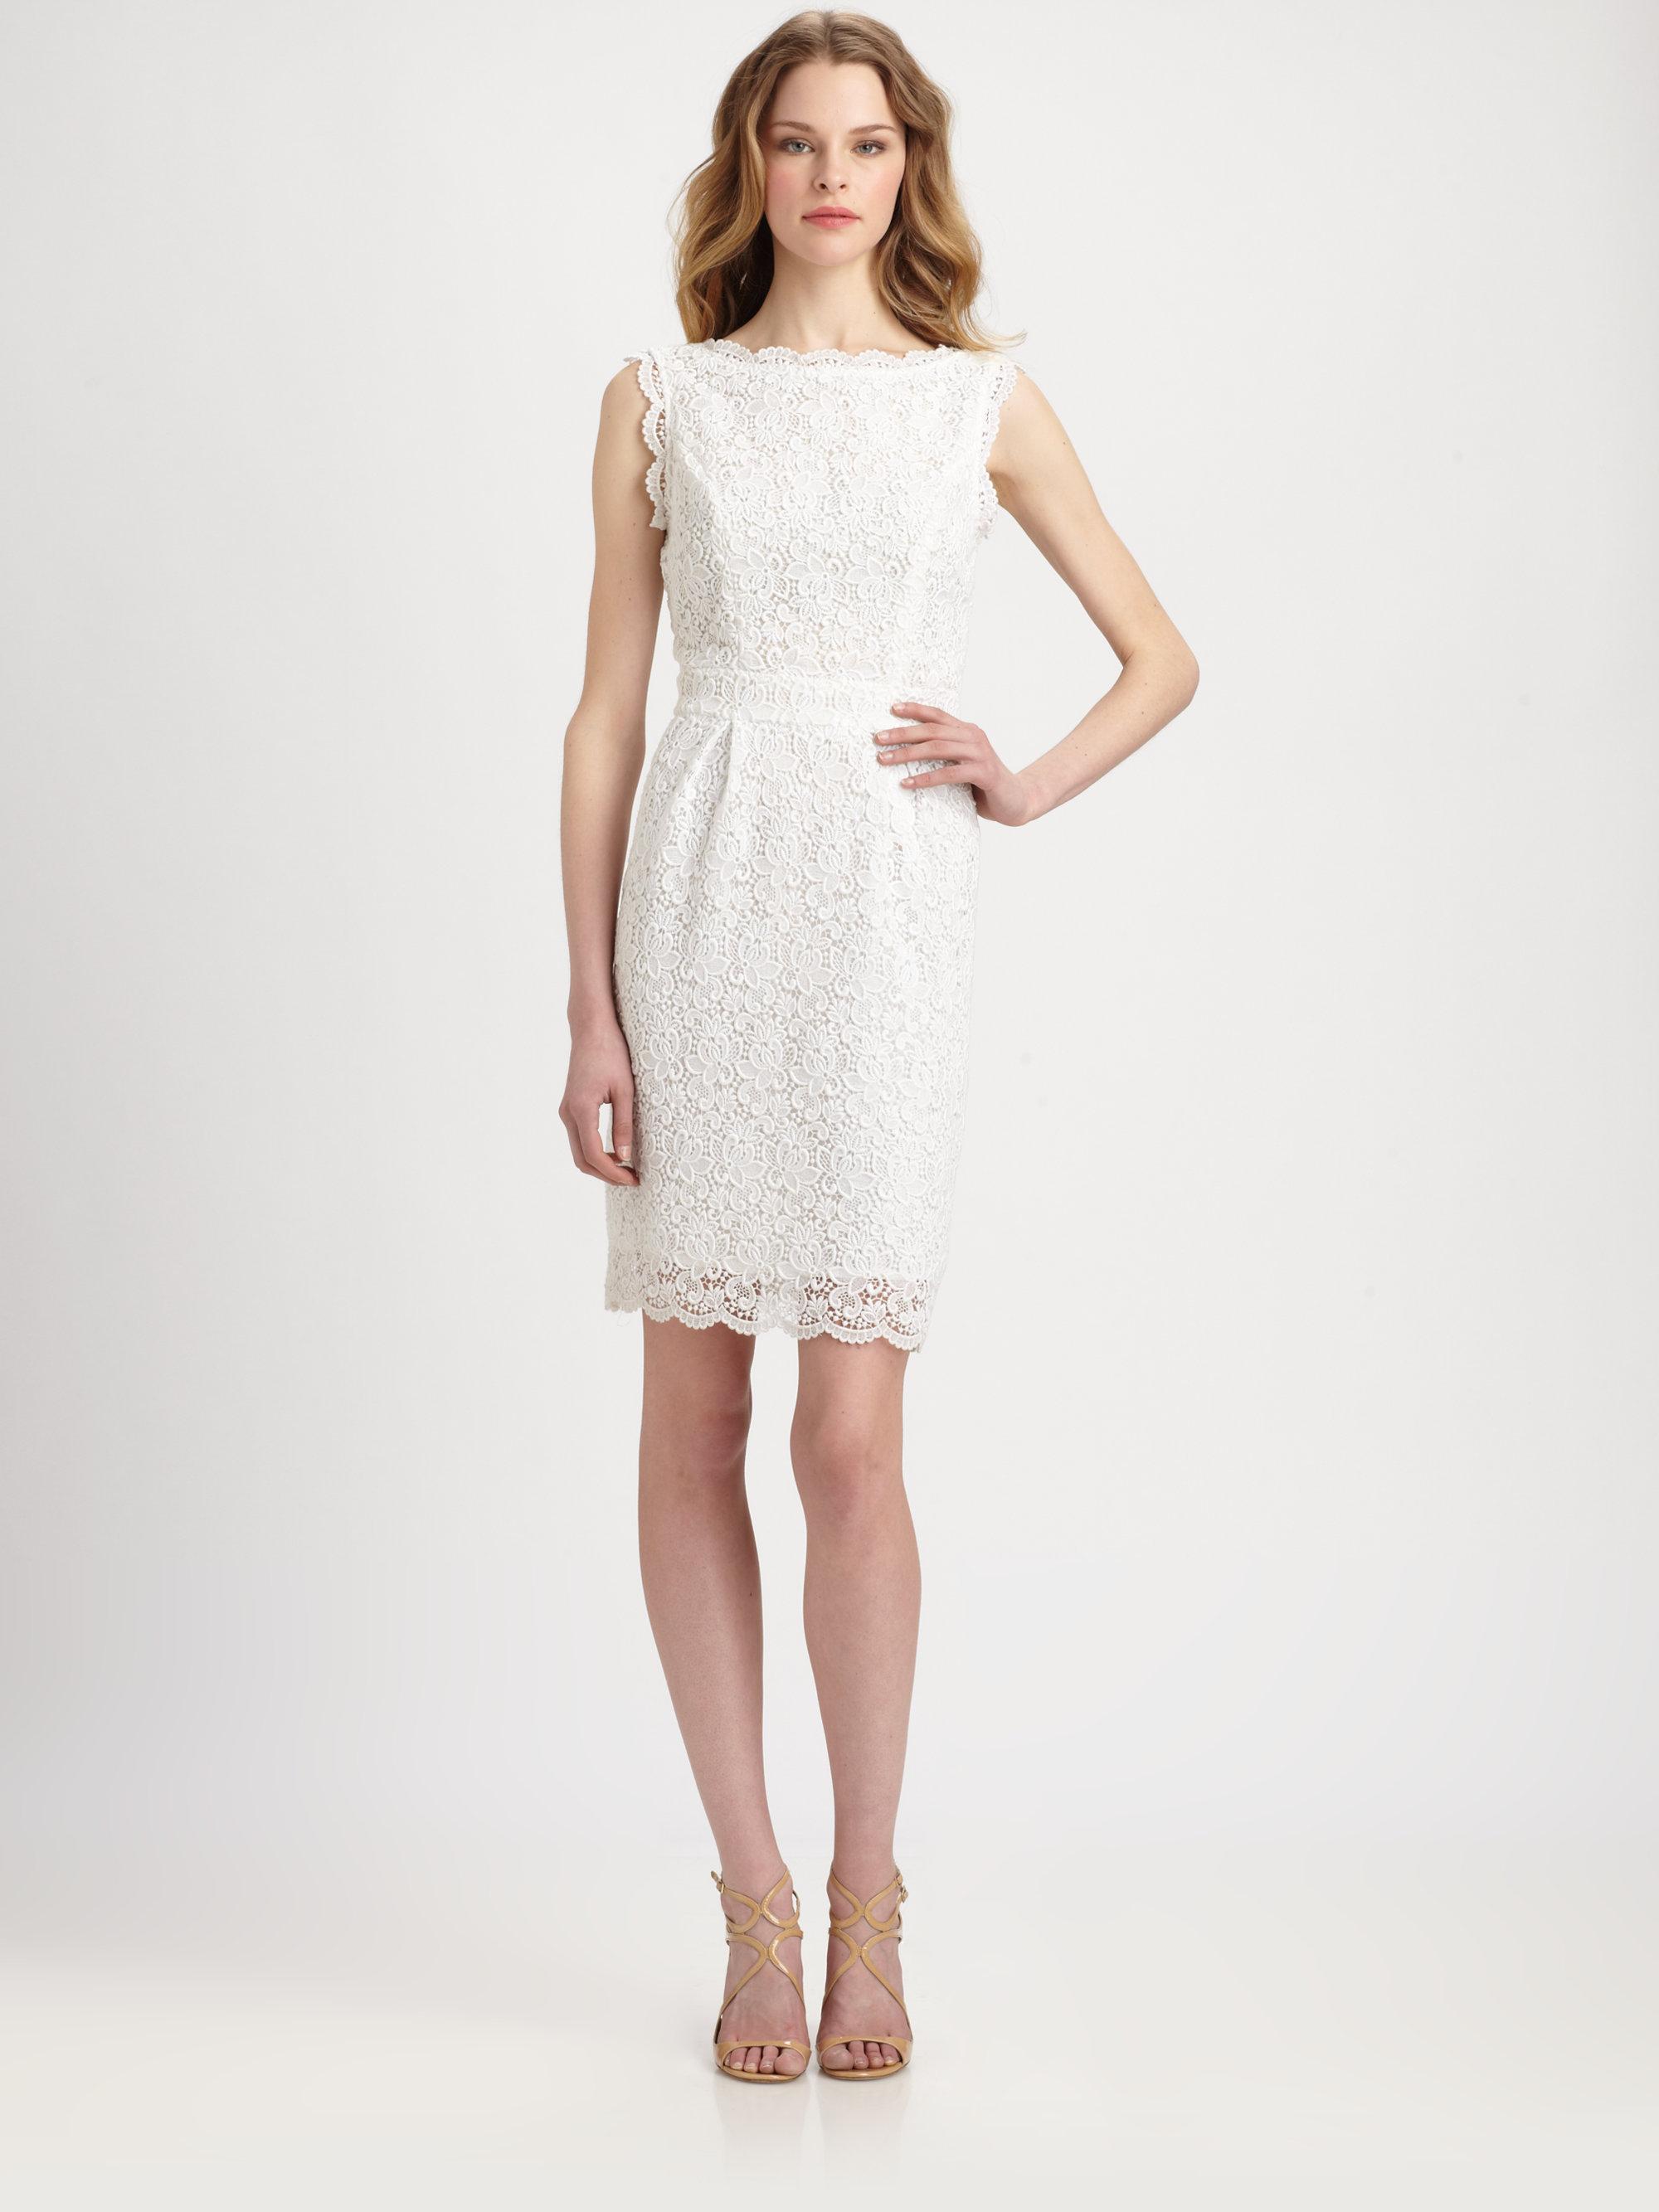 Shoshanna Nyla Cotton Lace Sheath Dress in White | Lyst